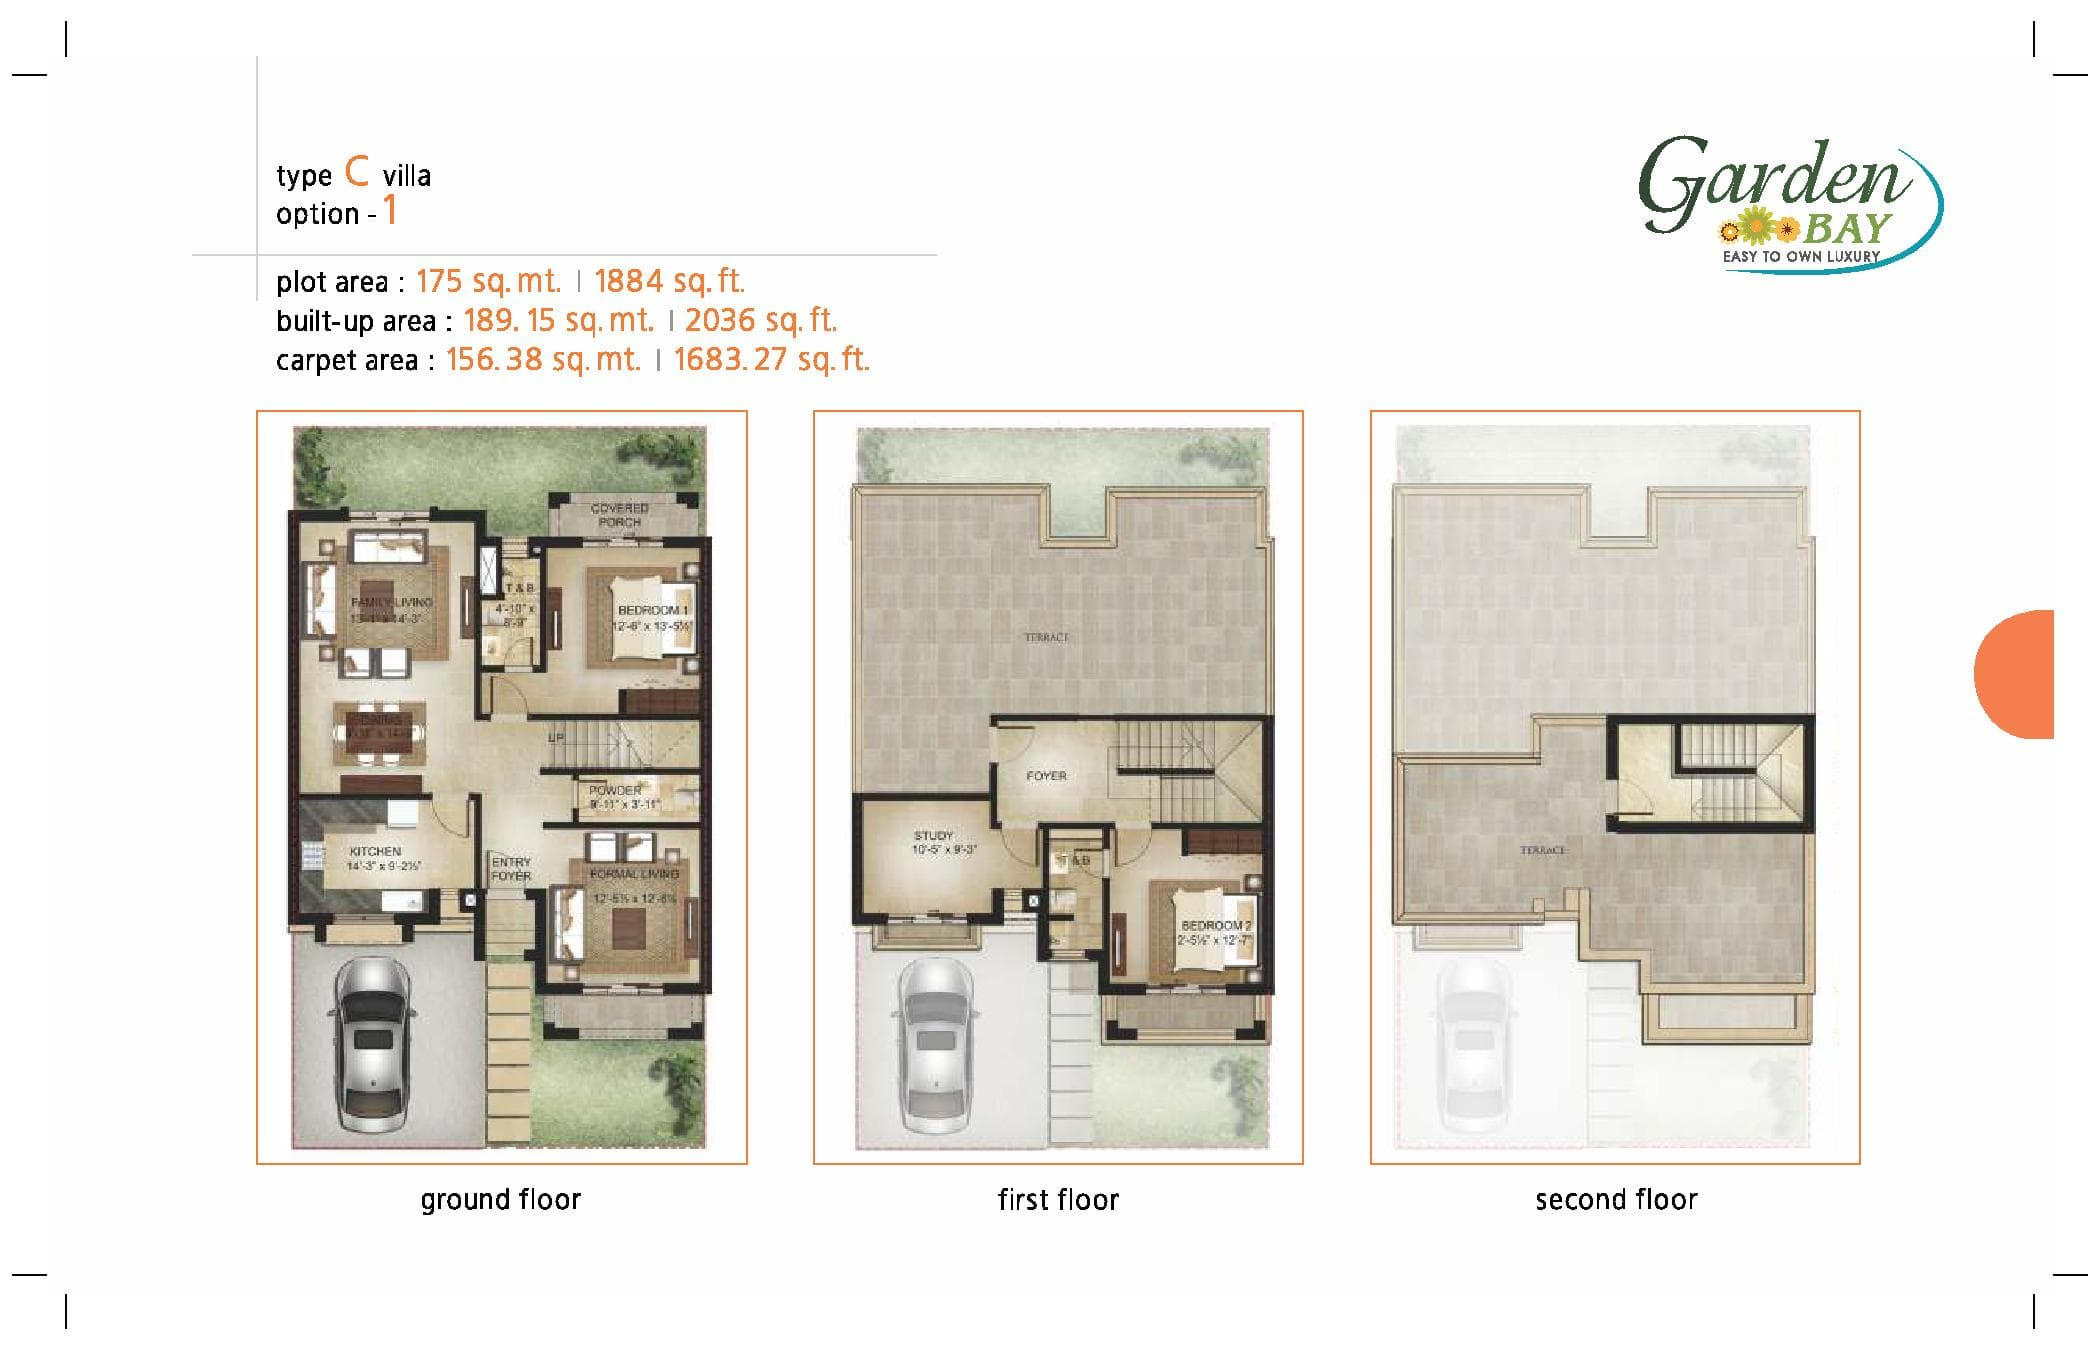 Garden Bay Type C Villa